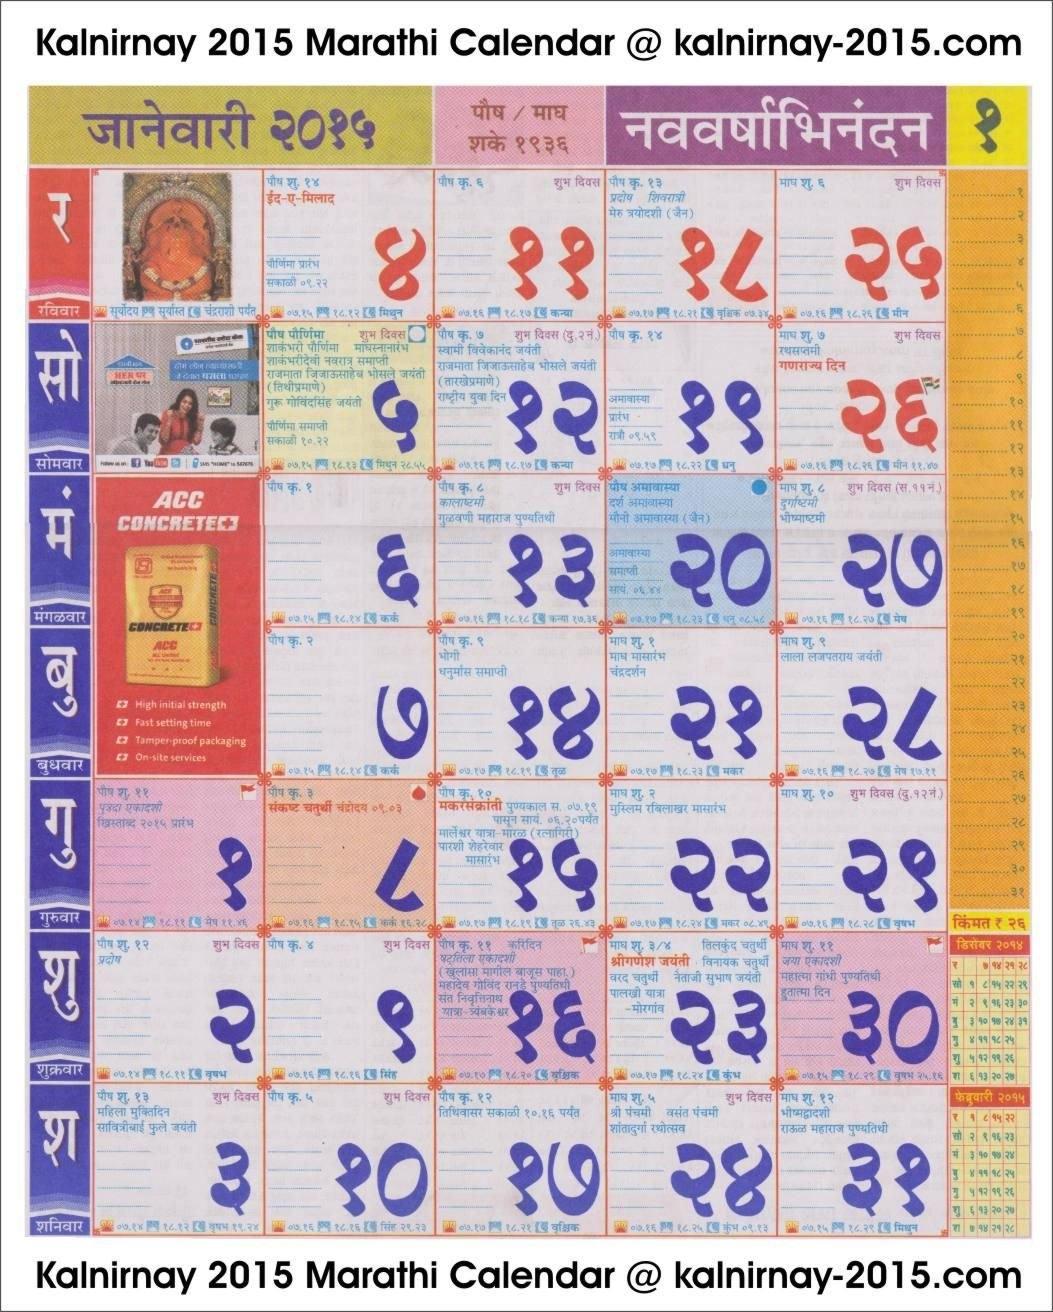 January 2015 Marathi Kalnirnay Calendar   2015 Kalnirnay Marathi Calendar 2019 Kalnirnay March